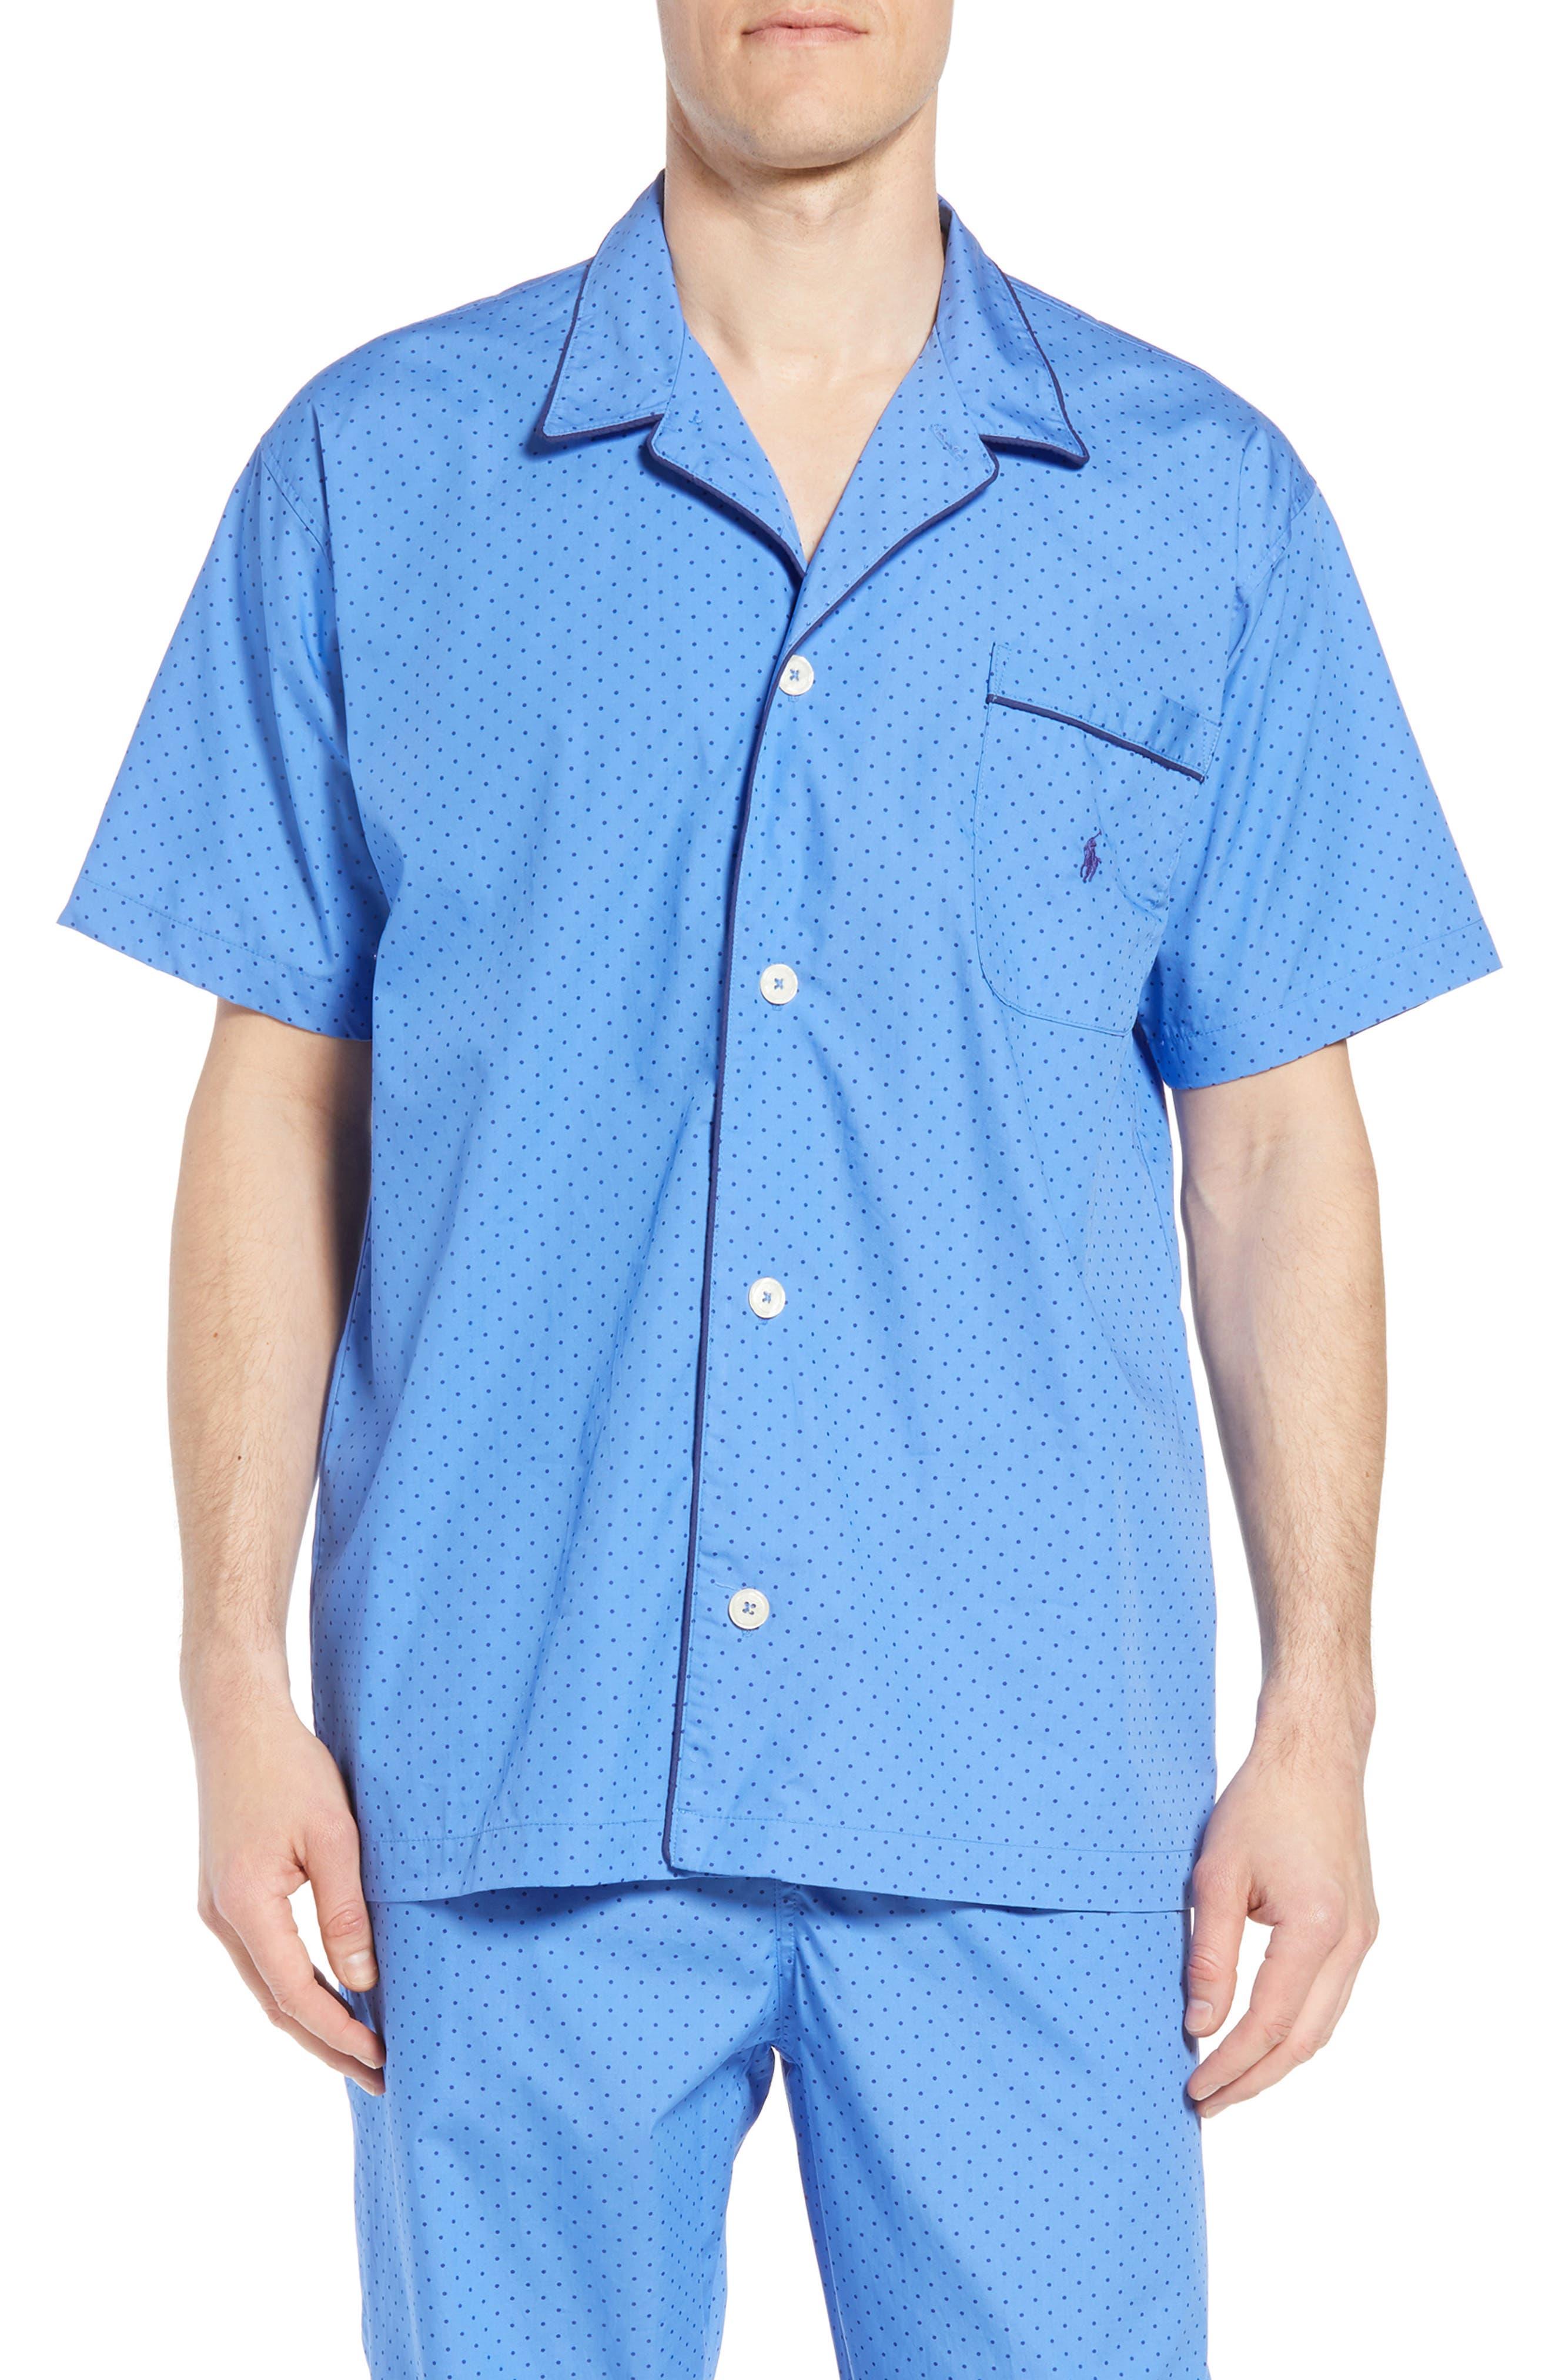 POLO RALPH LAUREN Dot Cotton Pajama Shirt, Main, color, 451